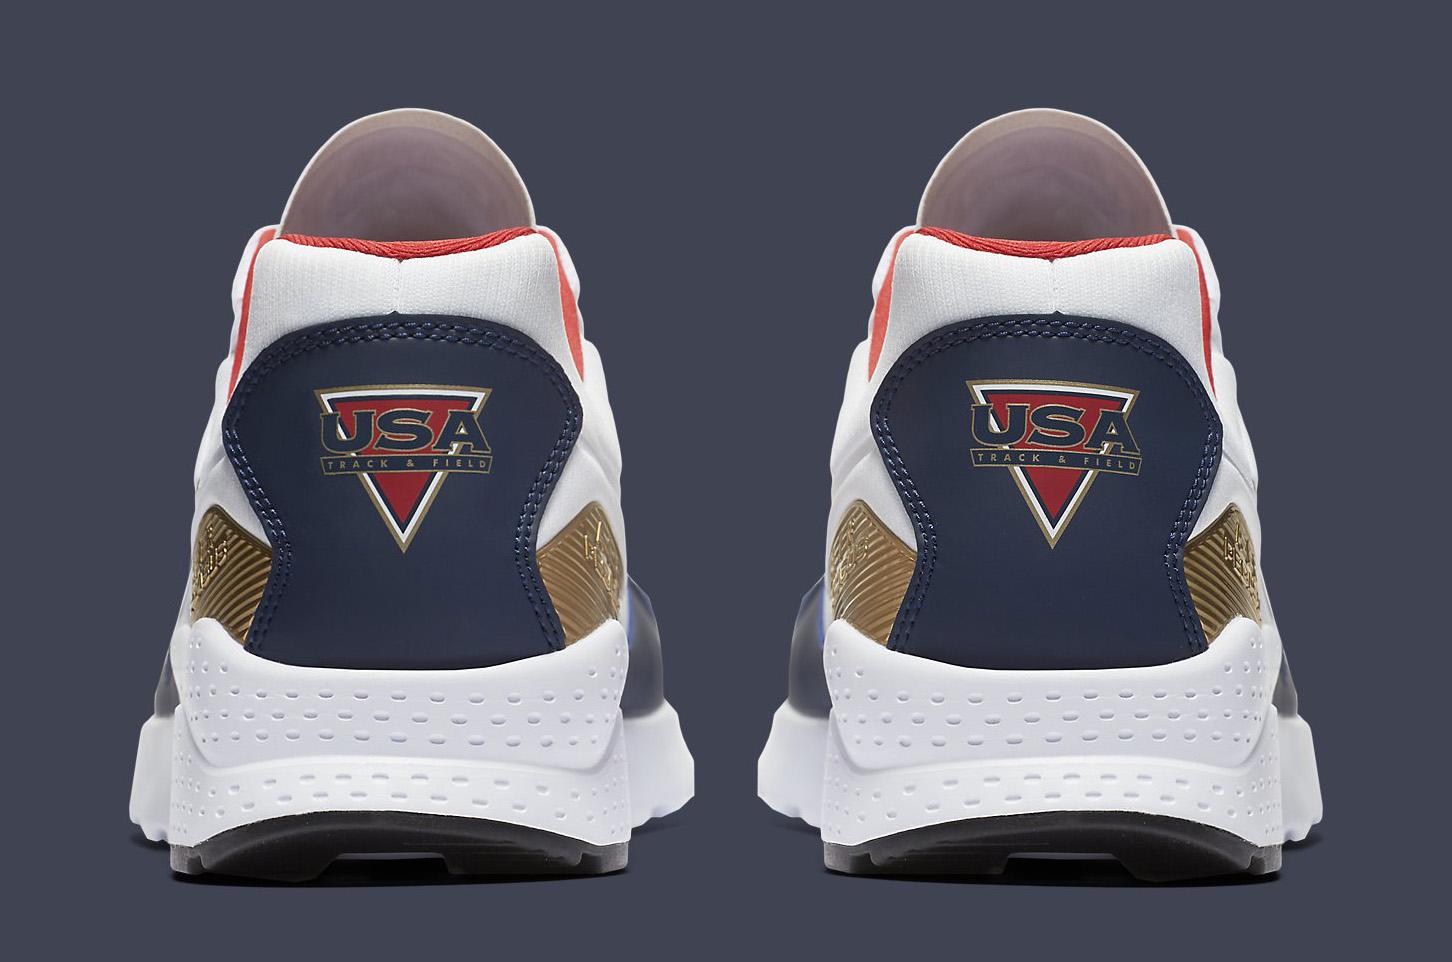 ab46c5025 USA Nike Pegasus 92 Olympics | Sole Collector